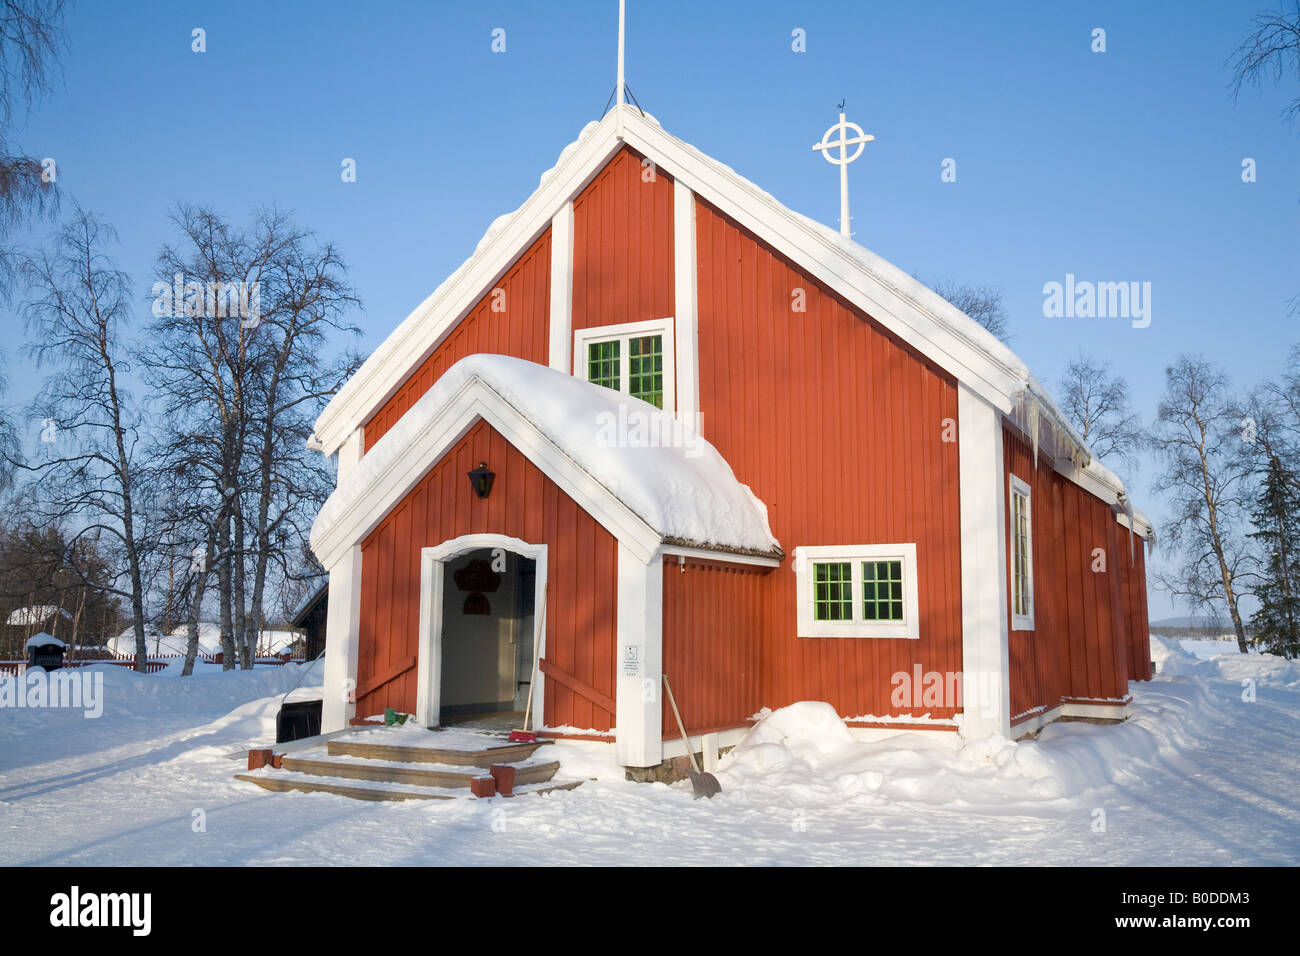 The church of Jukkasjarvi / Northern Sweden - Stock Image